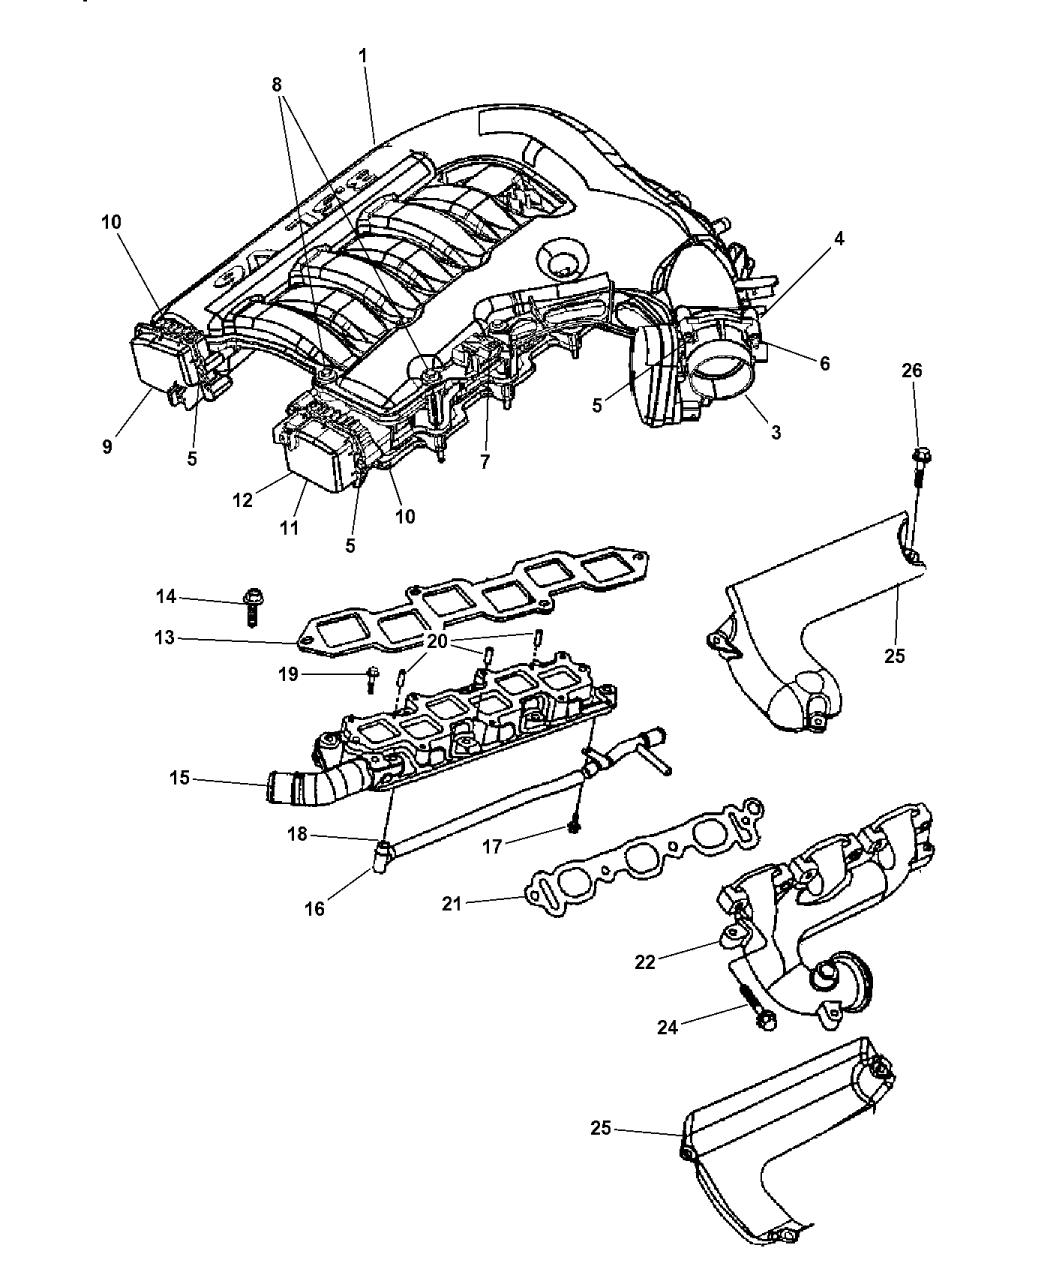 68036664aa genuine mopar plenum intake manifold rh moparpartsgiant com Ford E-150 Engine Intake North Star Engine Intake